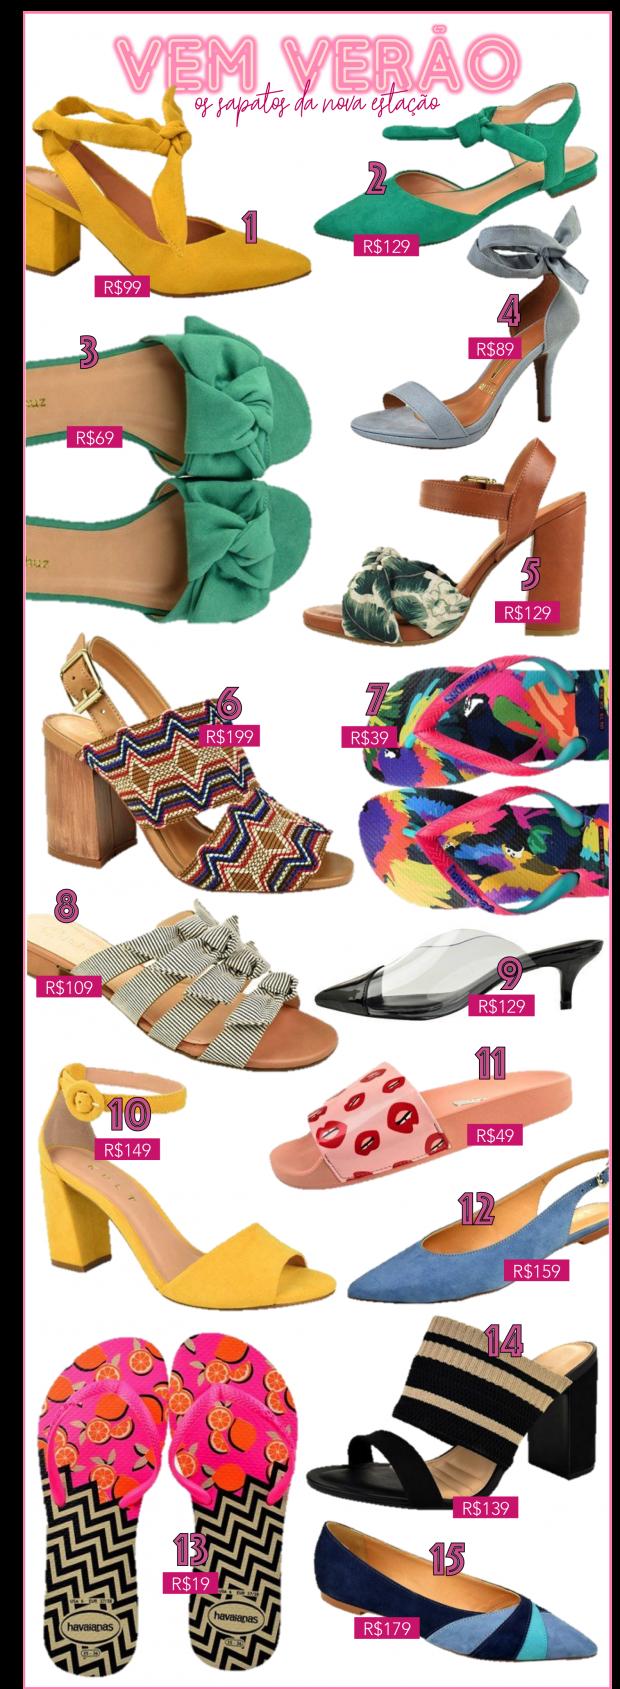 oscar calçados Archives - Página 2 de 5 - Fashionismo 4cac2dd984f